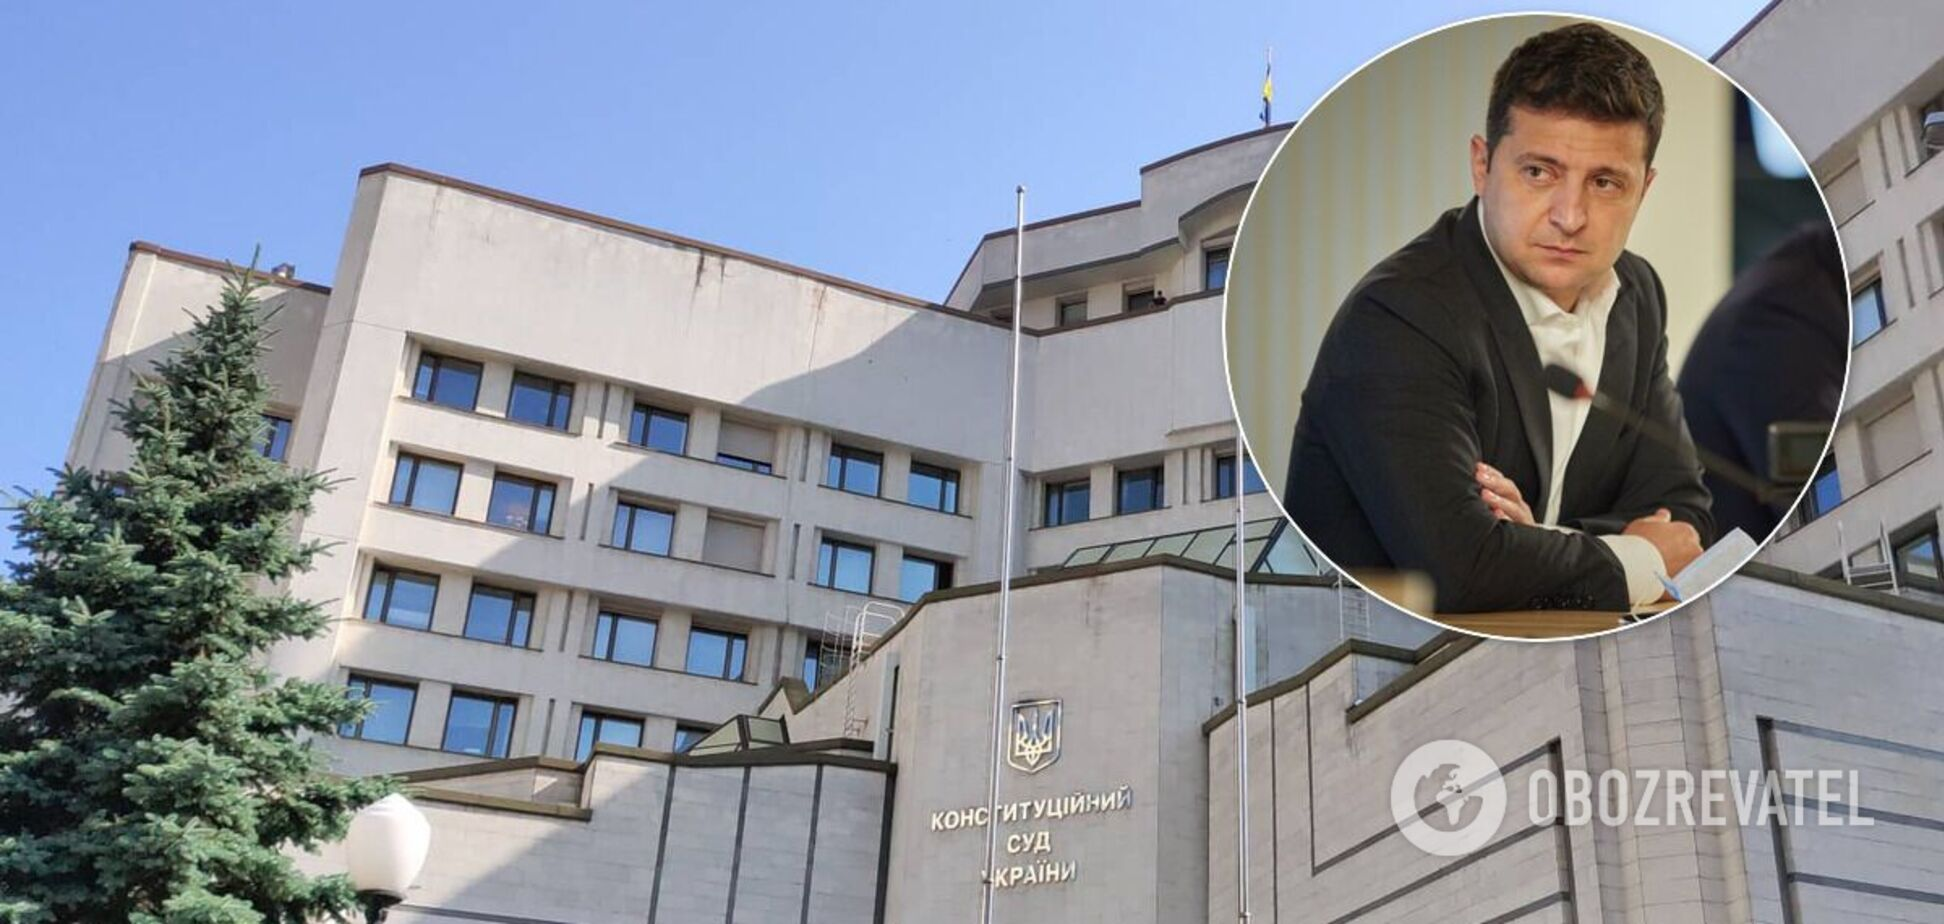 Офис президента знал о решении КСУ заранее